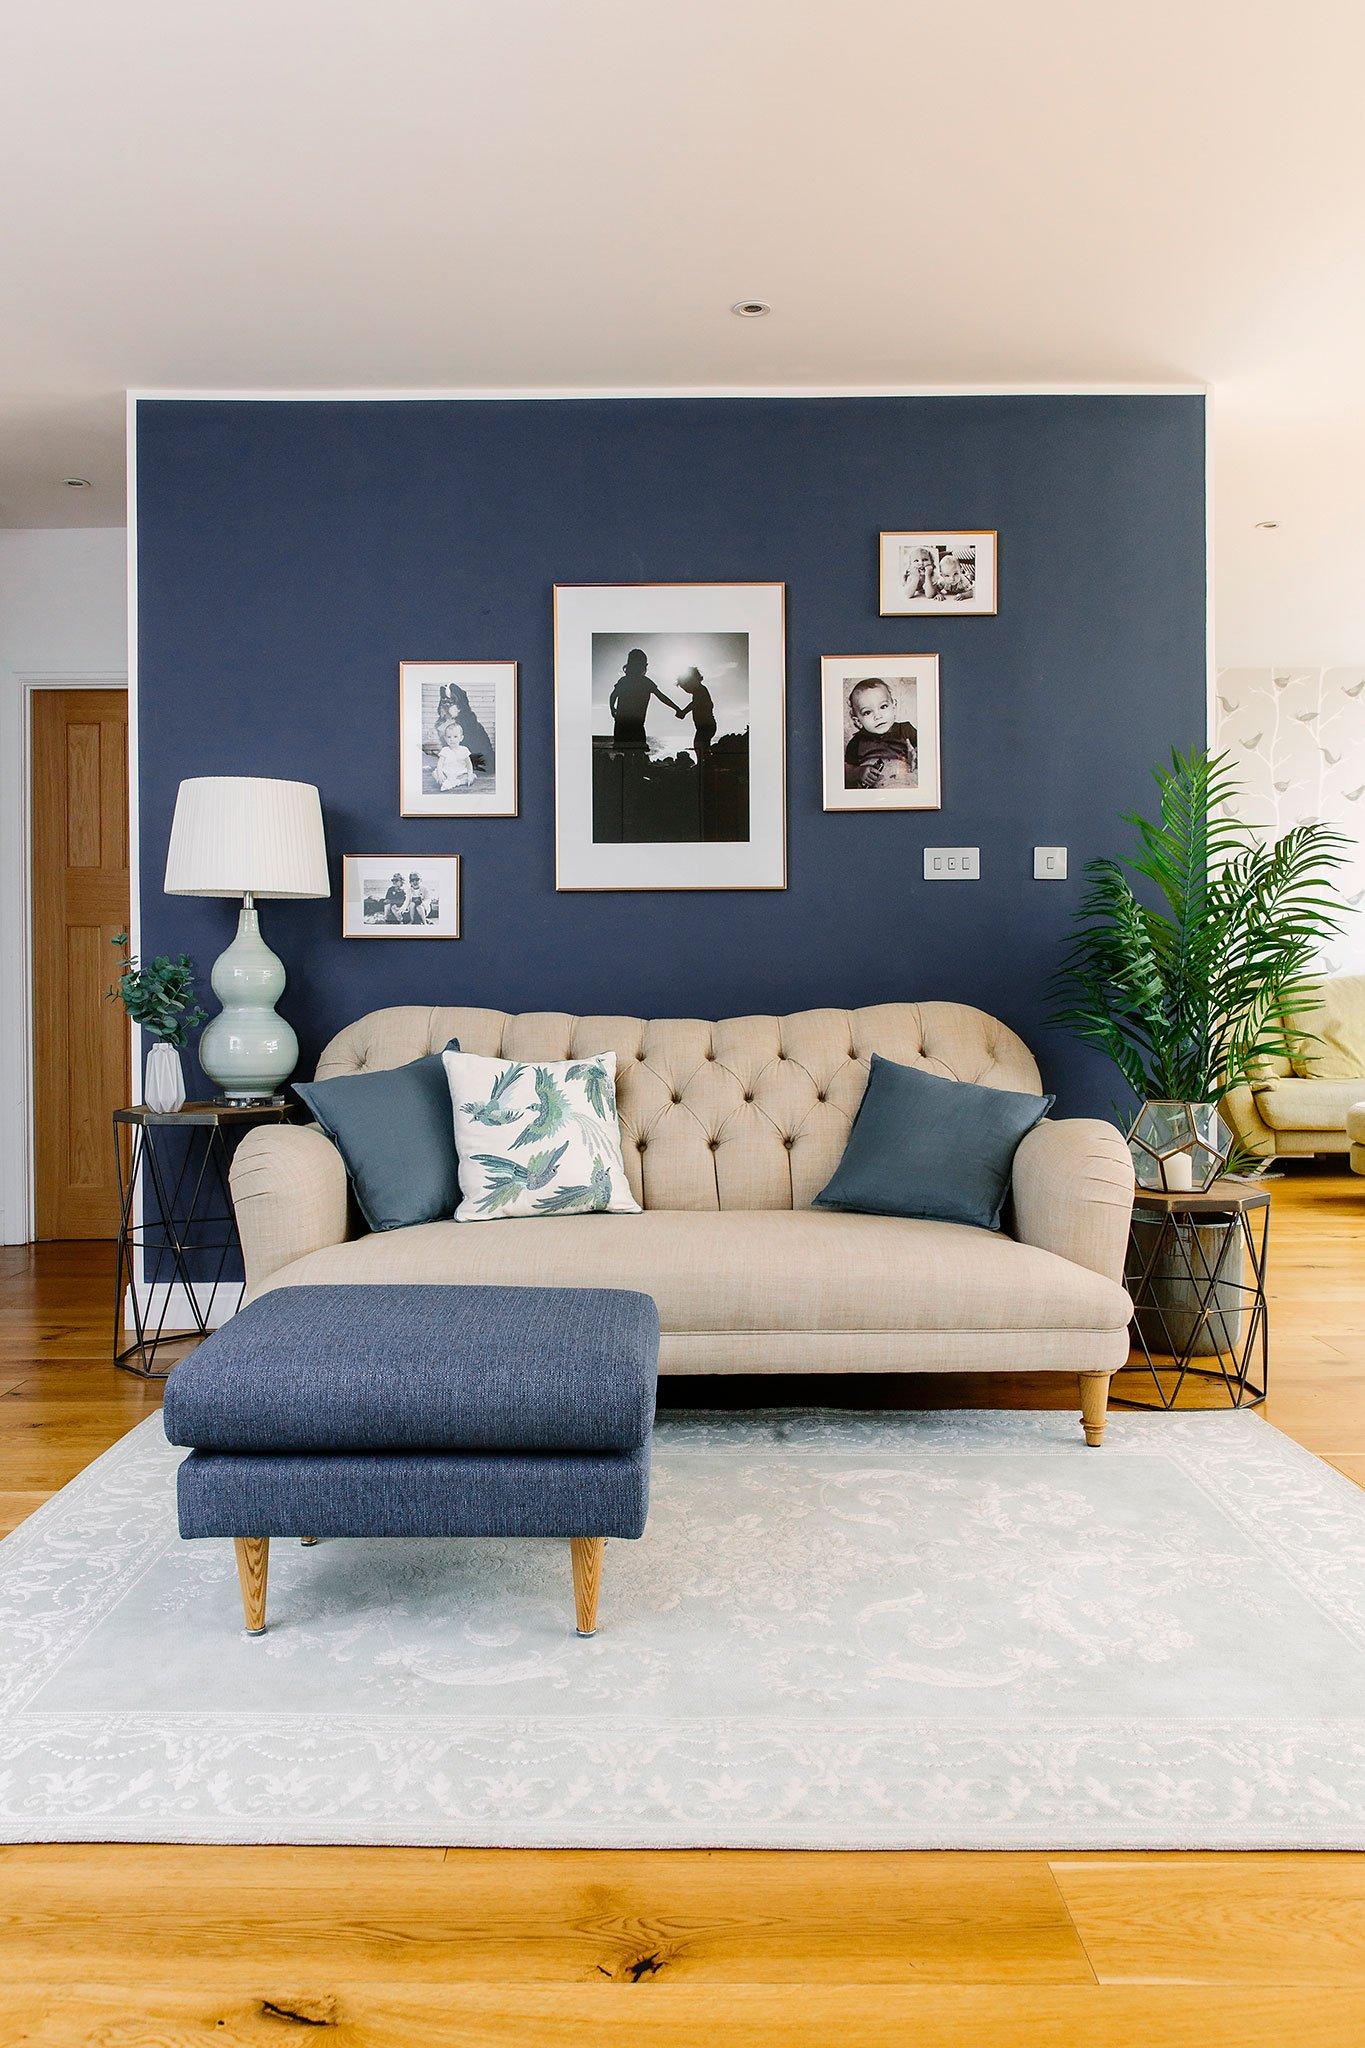 jasmine harman a place in the sun living space vegan room design